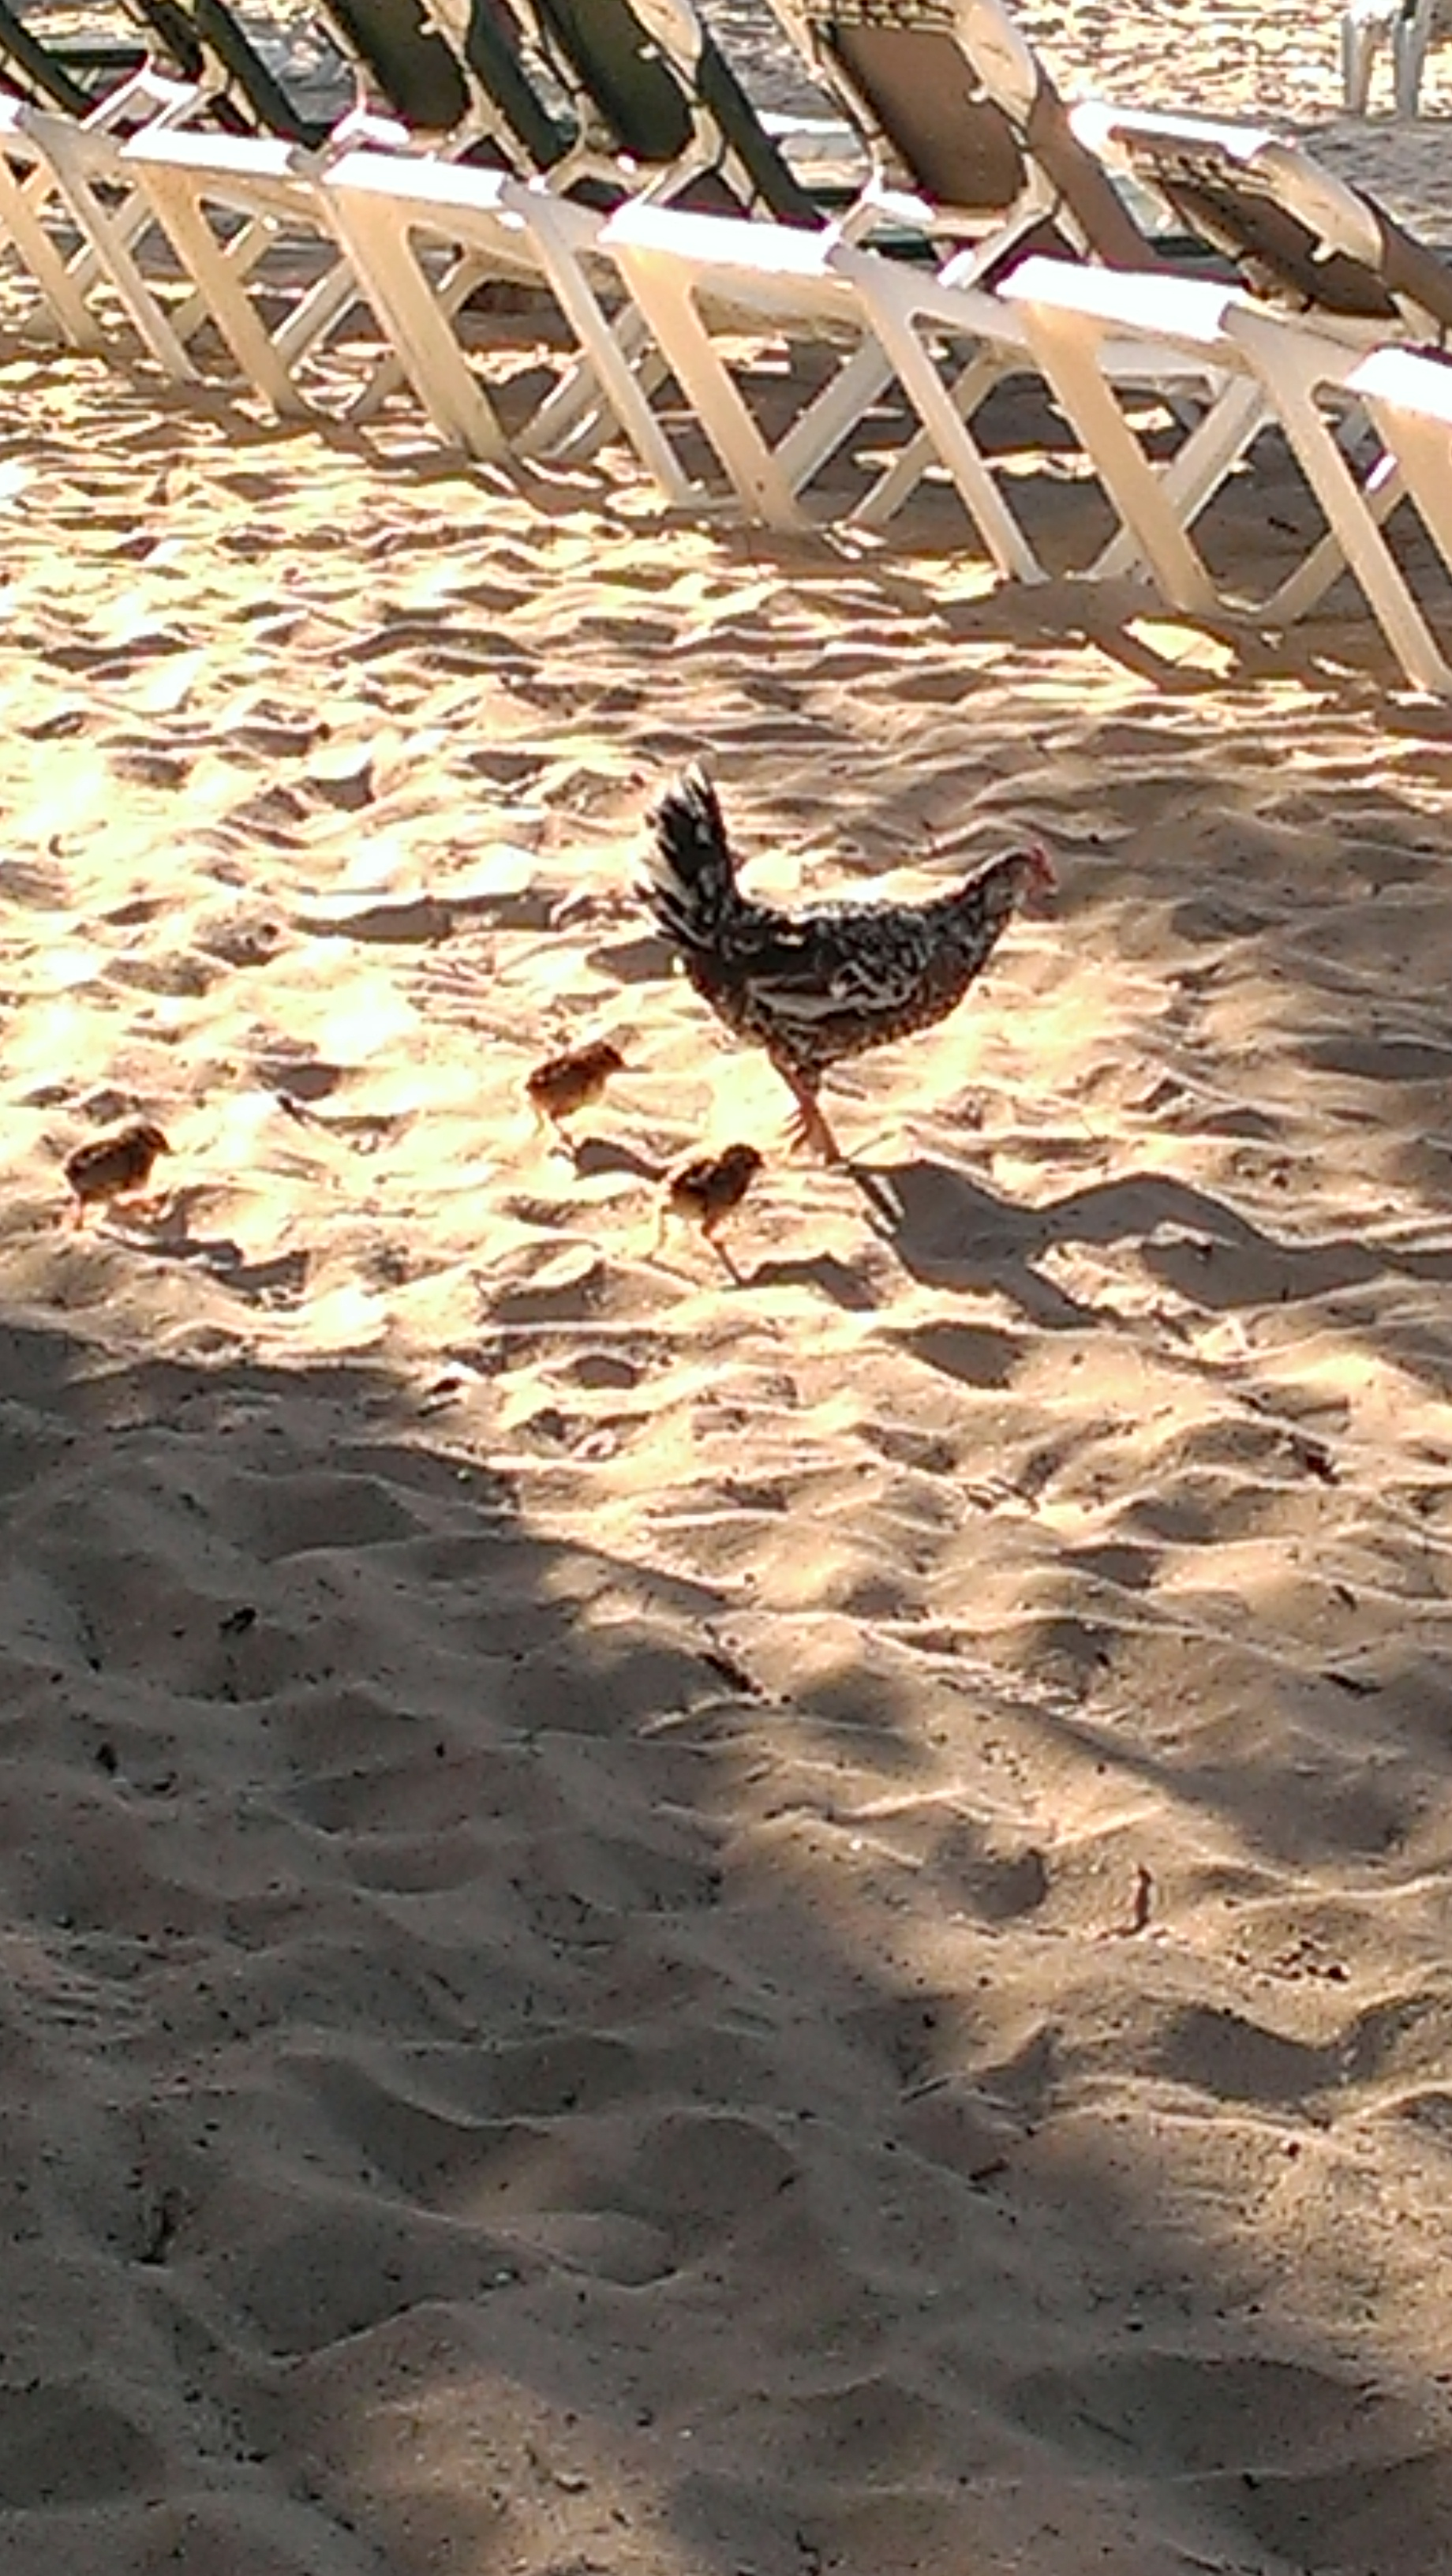 Hot Chicks on the Beach